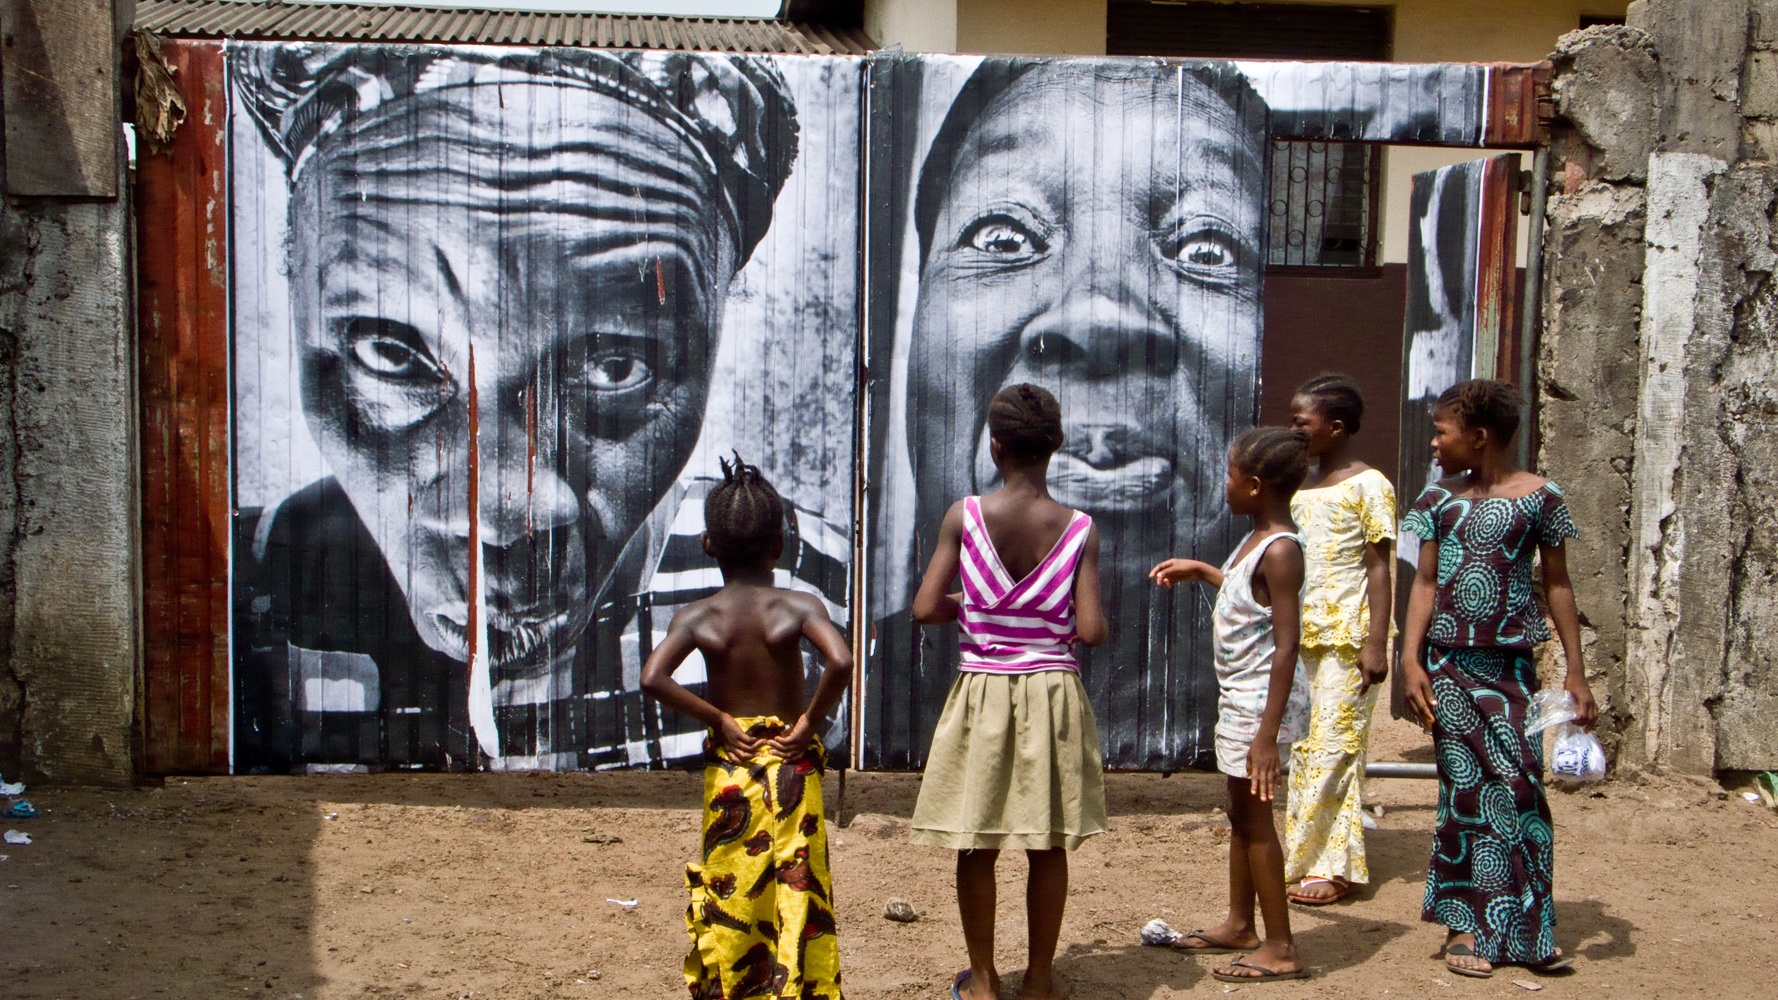 JR,  28 Millimétres; Women Are Heroes, Pasting in Monrovia streets, Liberia,  2008, Color photograph, matte plexiglass, aluminum, wood, 125 x 222 cm | 49 1/4 in x 7.3 ft. Courtesy of ©JR-ART.NET